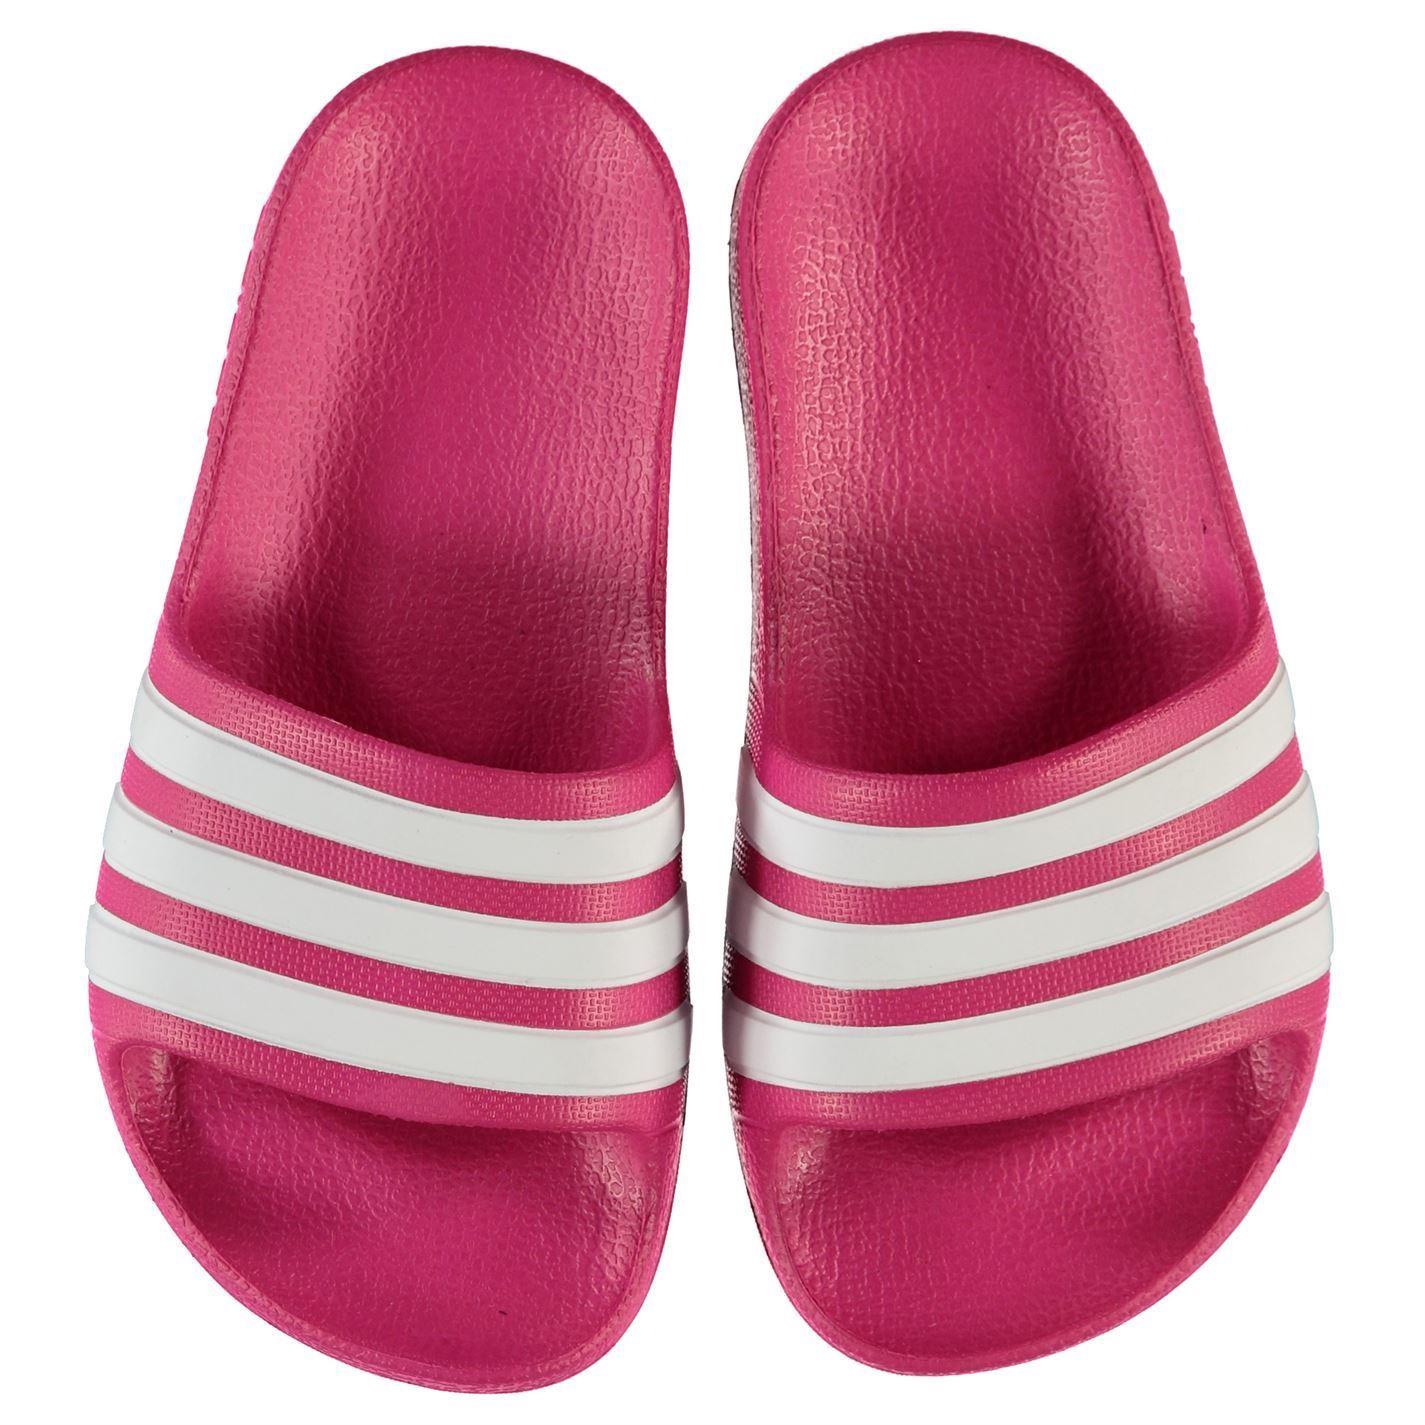 adidas Duramo Slide Pool Shoes Childs